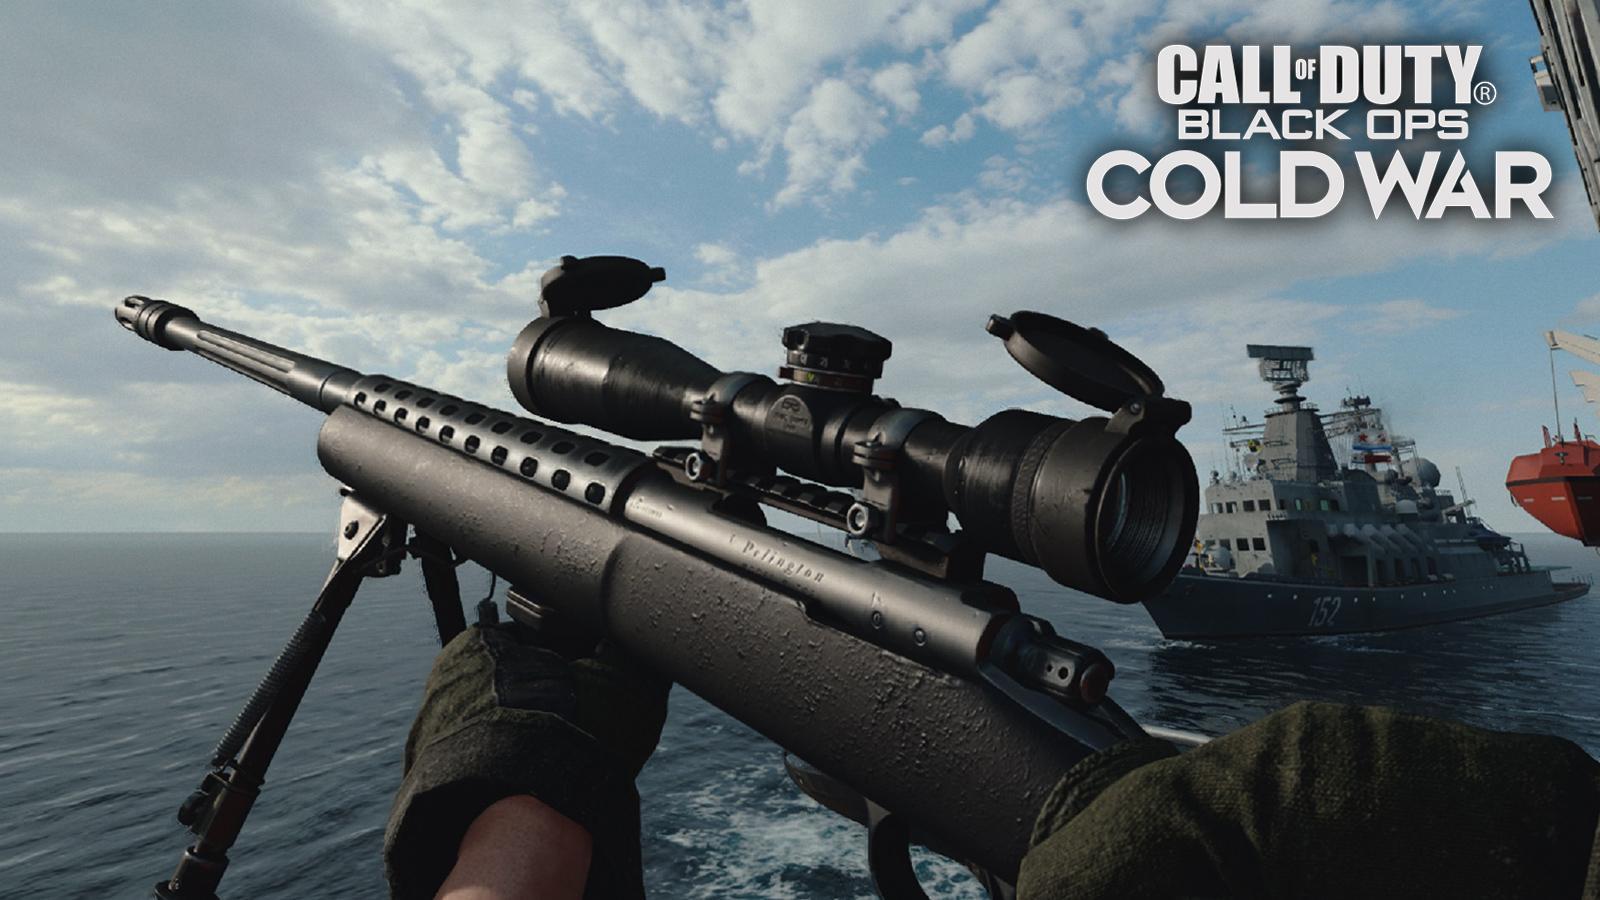 Sniper Call of Duty League